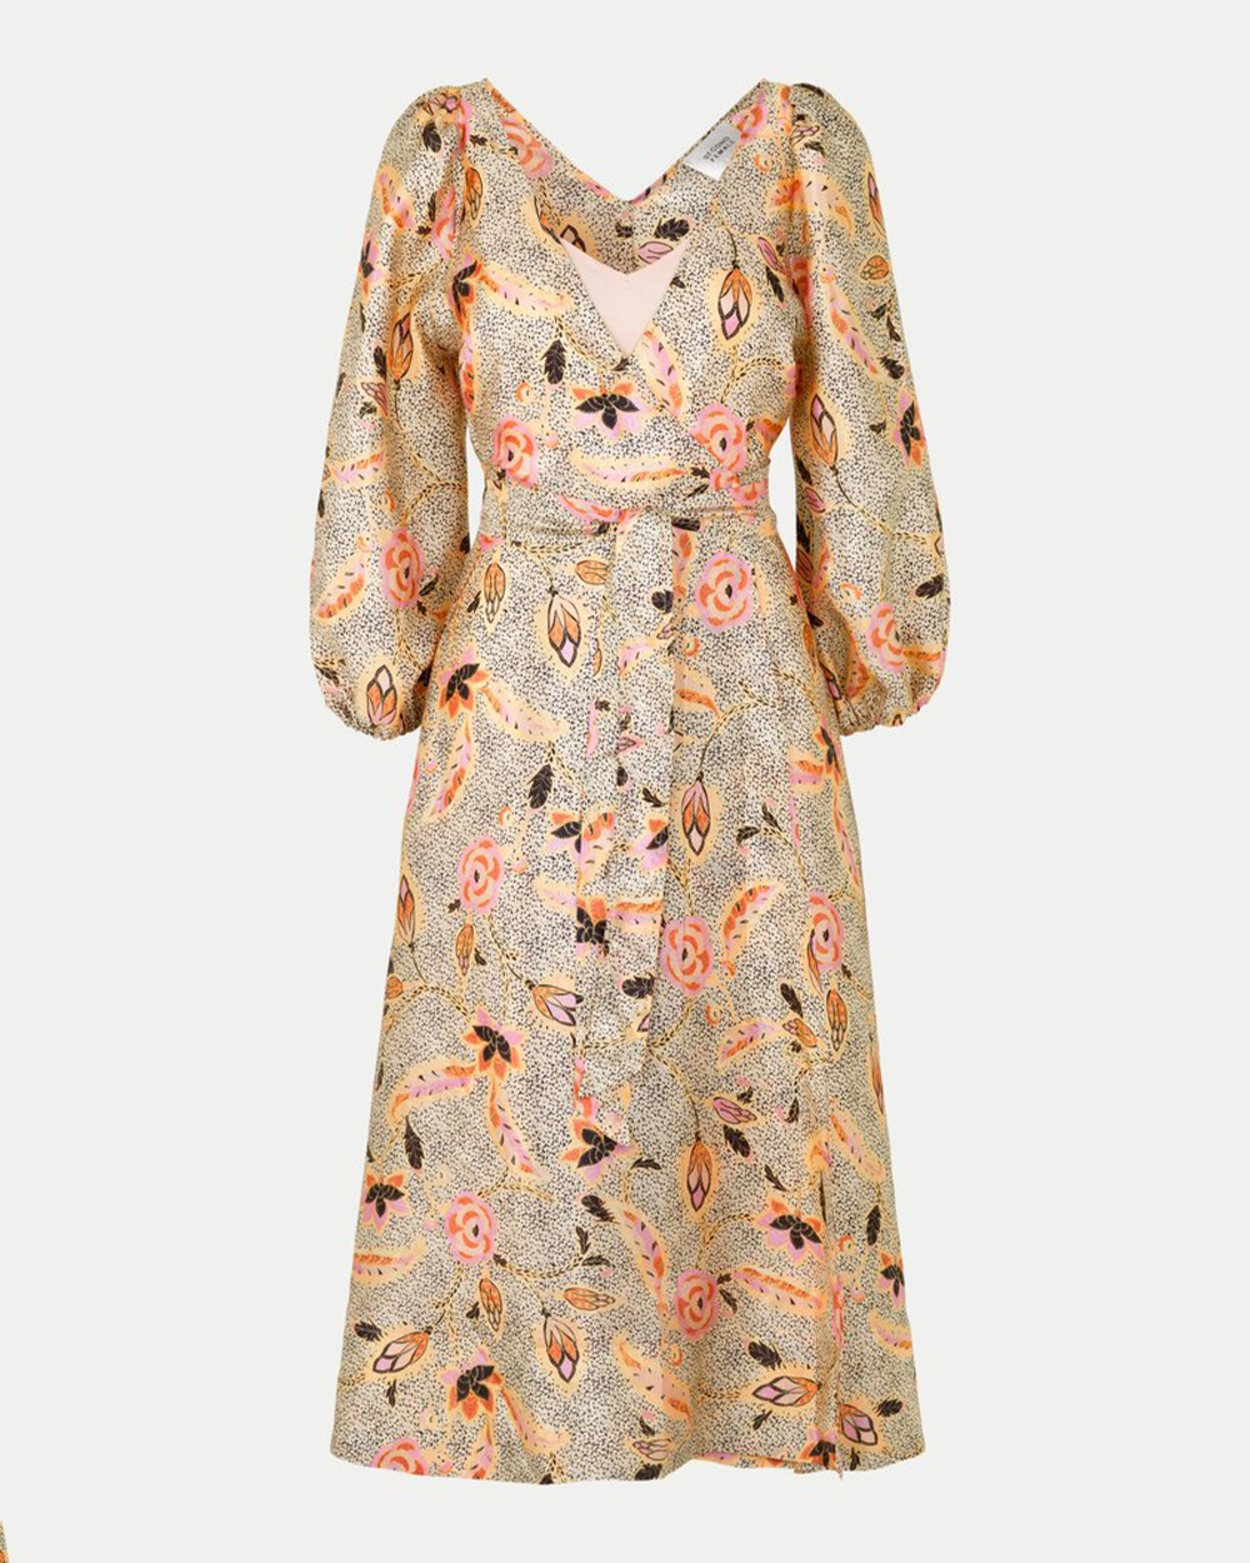 Eske Dress